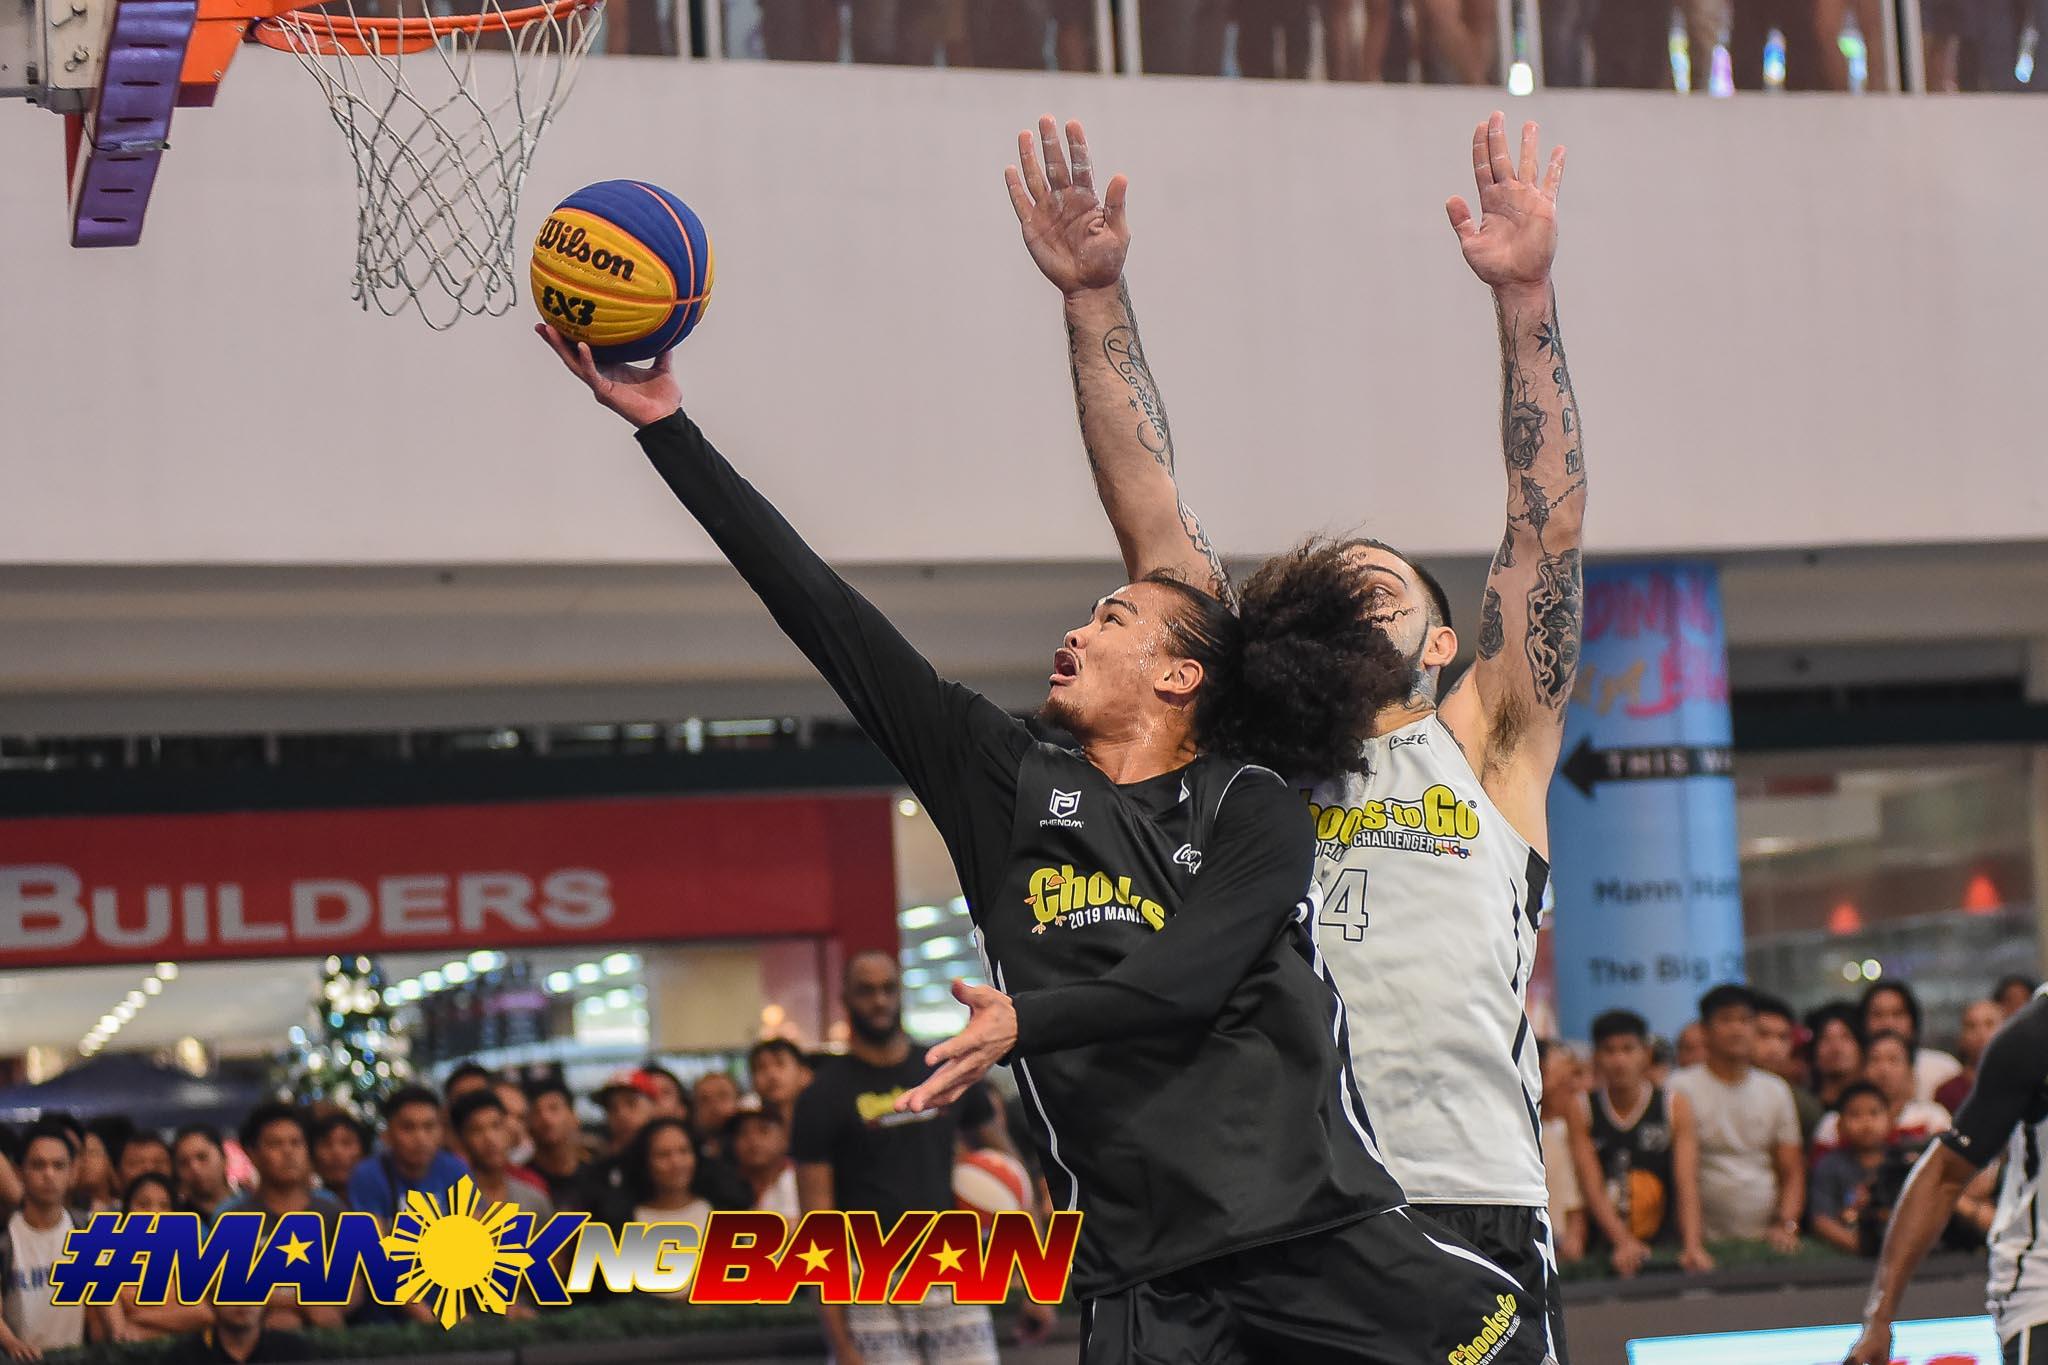 2019-chooks-to-go-manila-challenger-lyon-def-pasig-joshua-munzon Munzon, Pasaol to bring past experience vs Qatar, France to Gilas 3x3 3x3 Basketball Gilas Pilipinas News  - philippine sports news